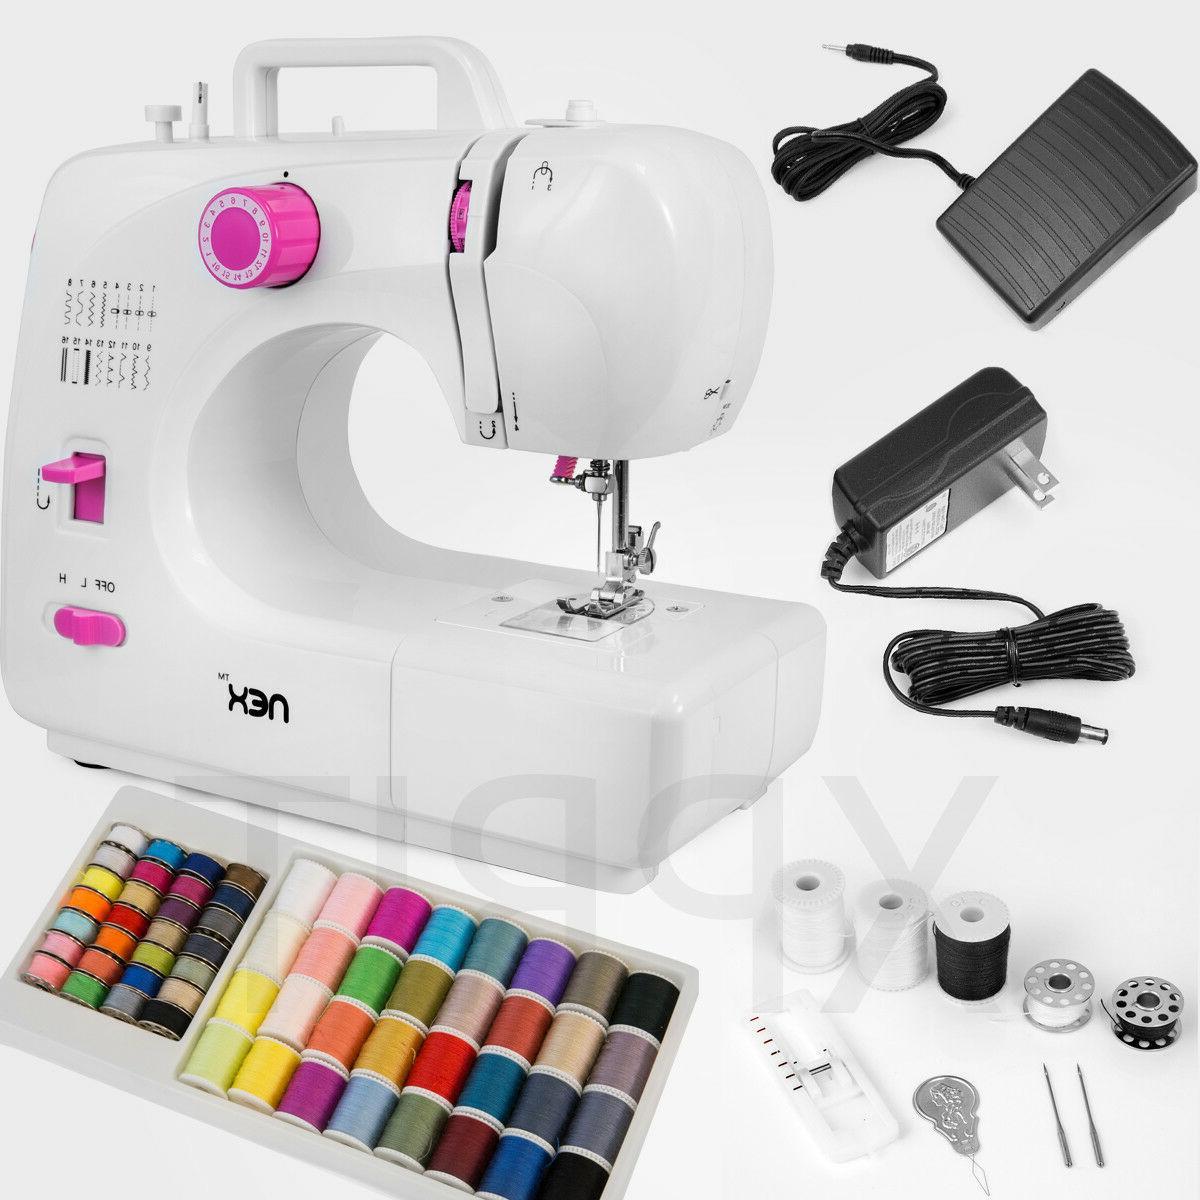 NEX 16 go line Sewing Machine FHSM-508 white Free shipping